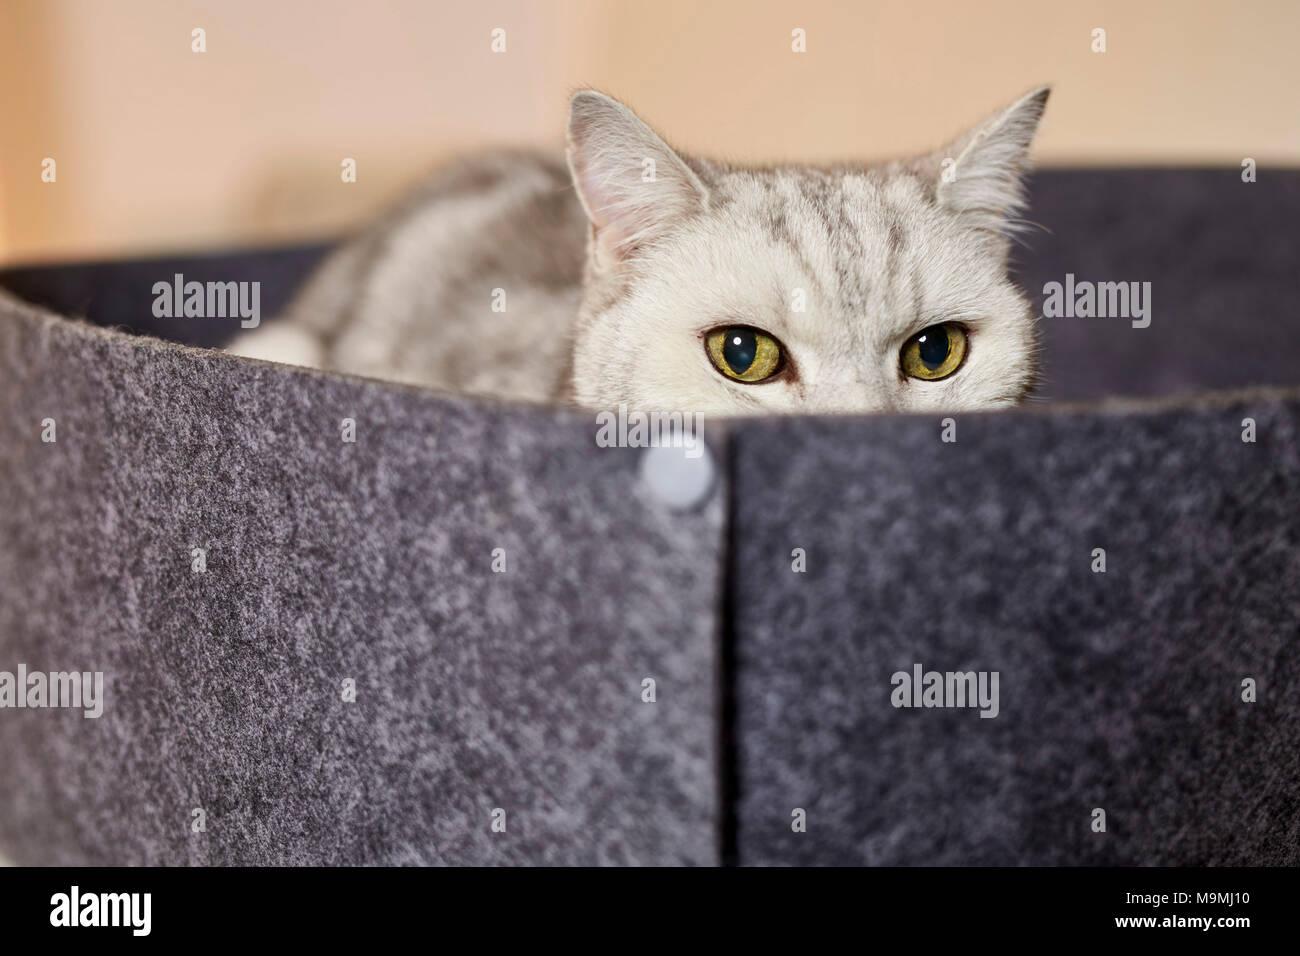 Britisch Kurzhaar Katze. Tabby nach Lügen Haustier Bett aus Filz. Deutschland Stockbild